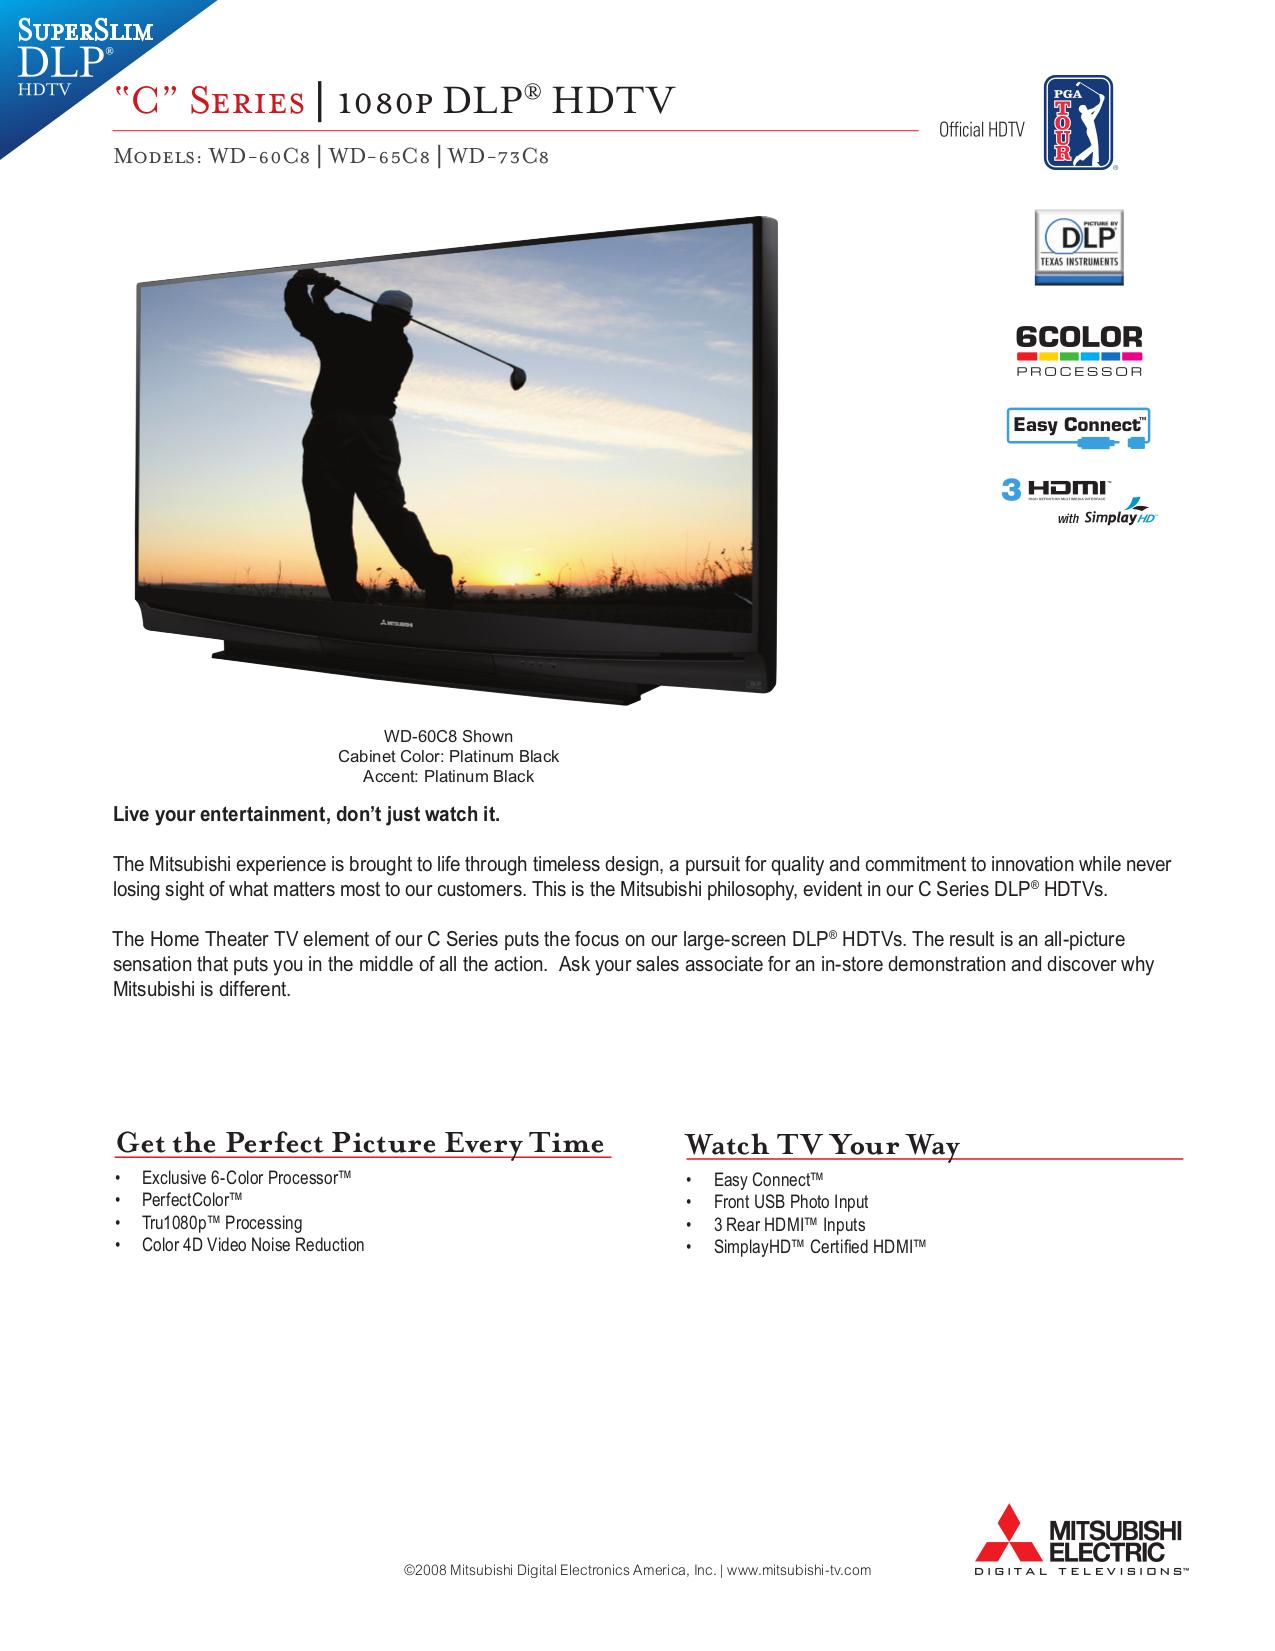 pdf for Mitsubishi TV WD-73C8 manual